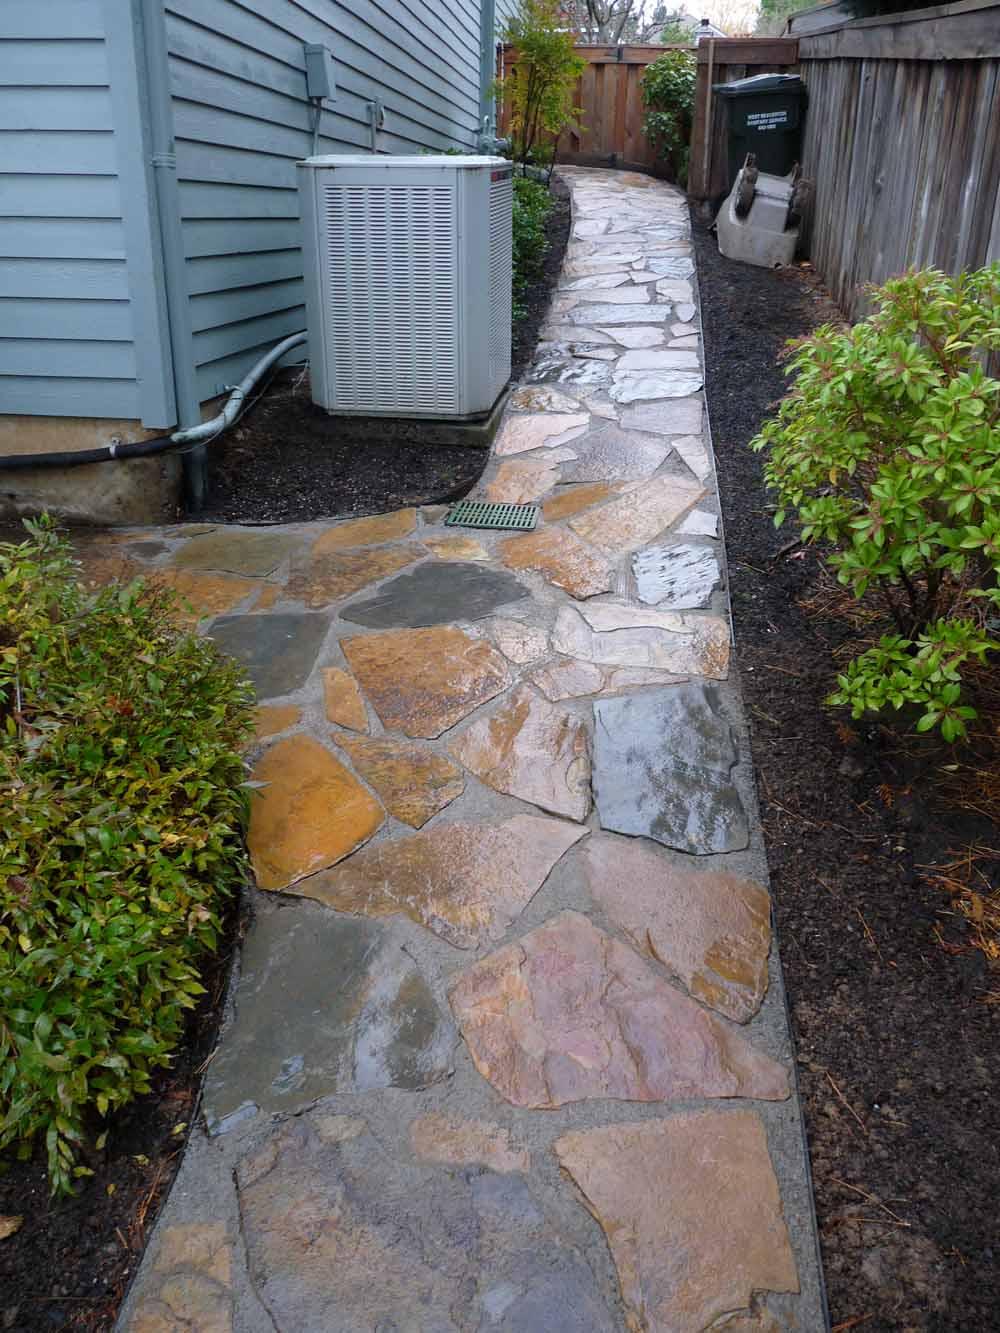 Flagstone-patios-and-walkways-olson-project-fall-2009 002